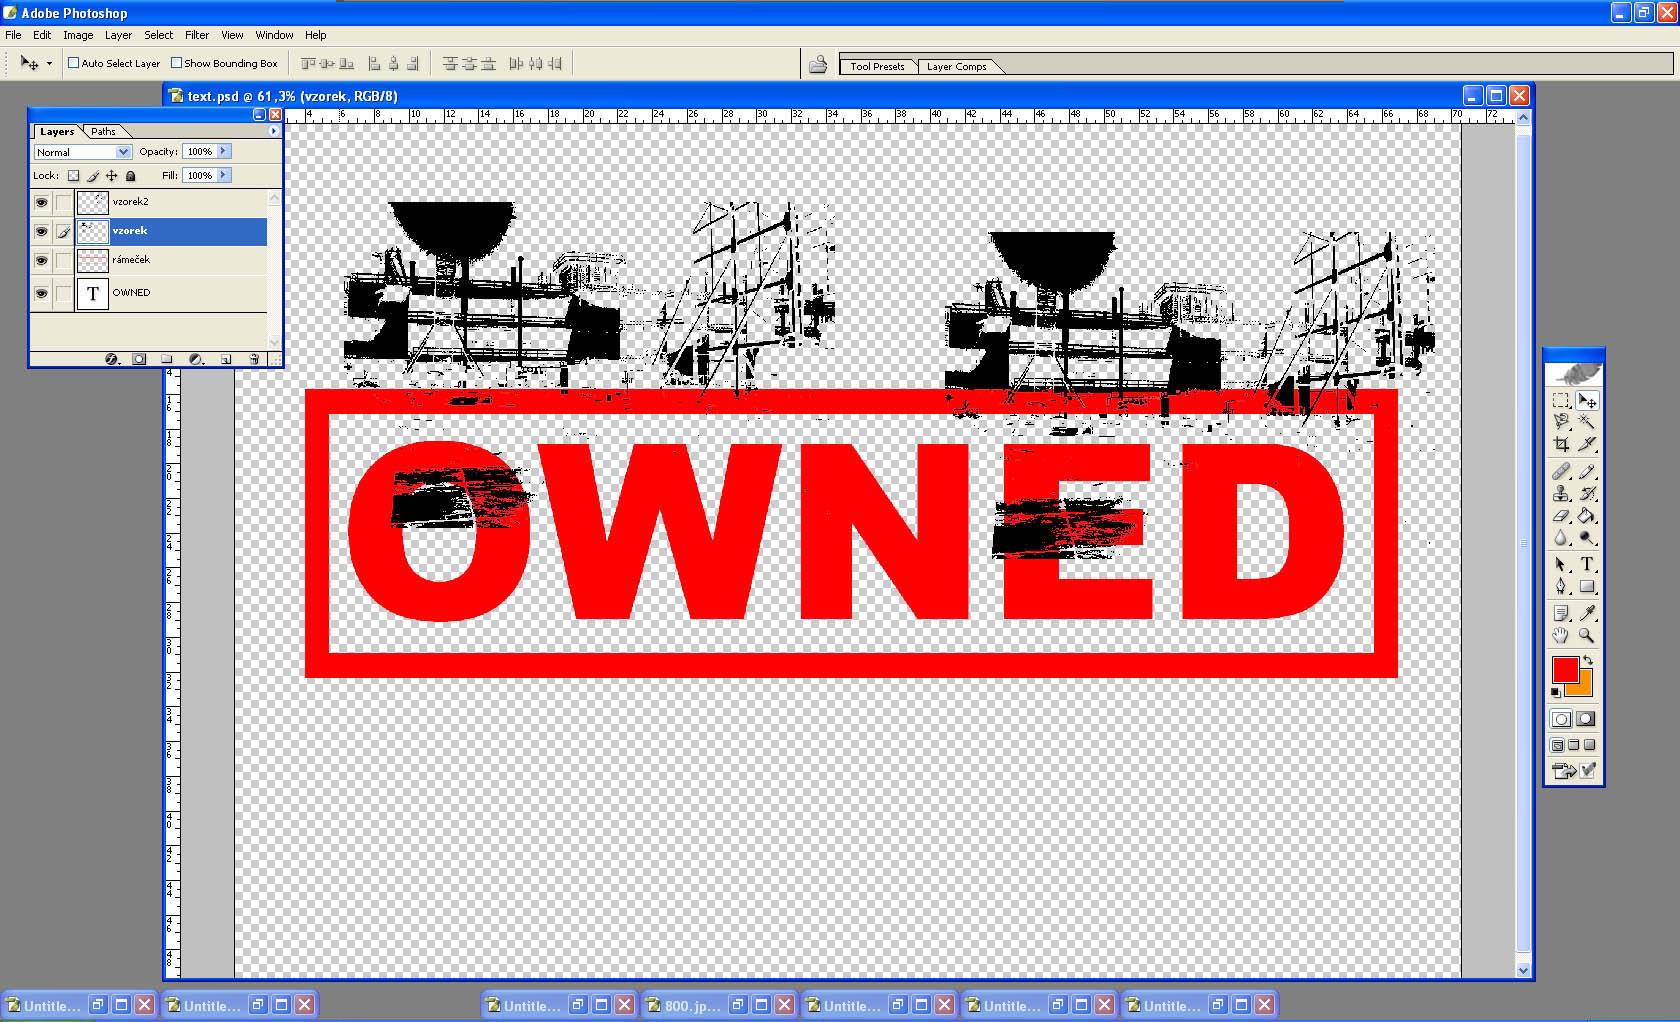 owned_part_7.jpg